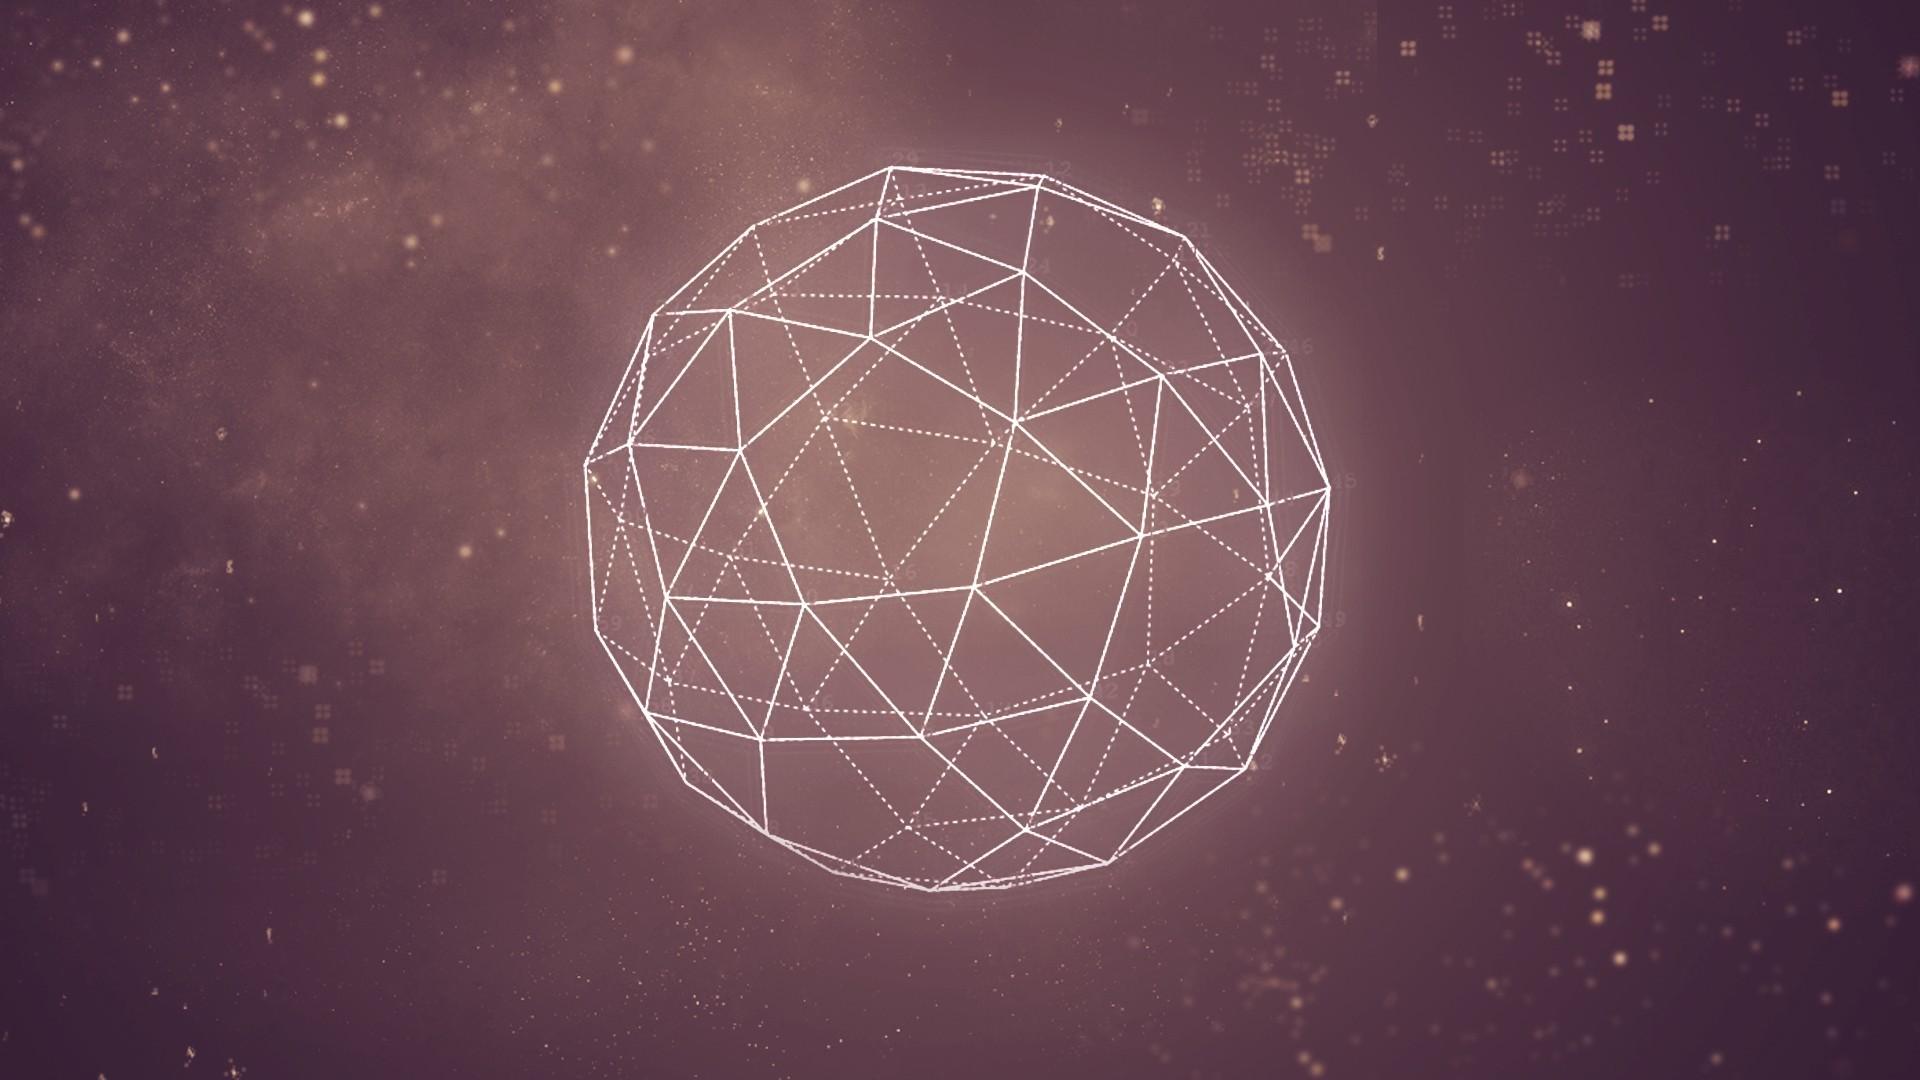 Geometric 3D Background hd background hd screensavers hd wallpaper .